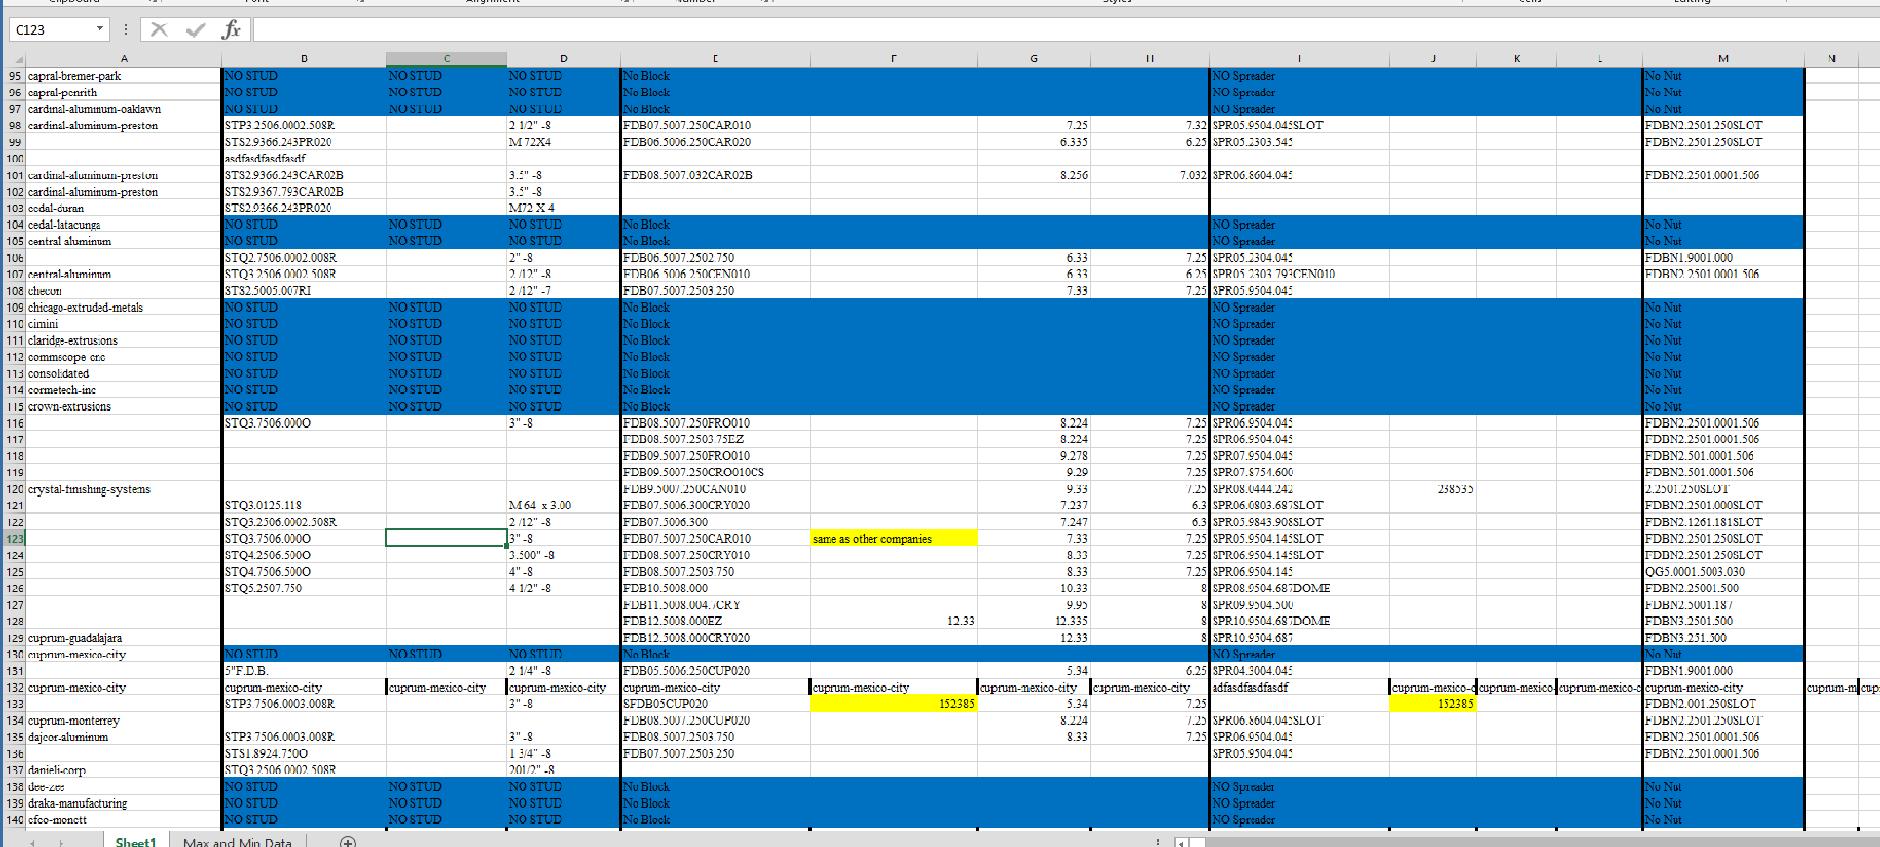 Inserting Blank Rows In Excel Vba